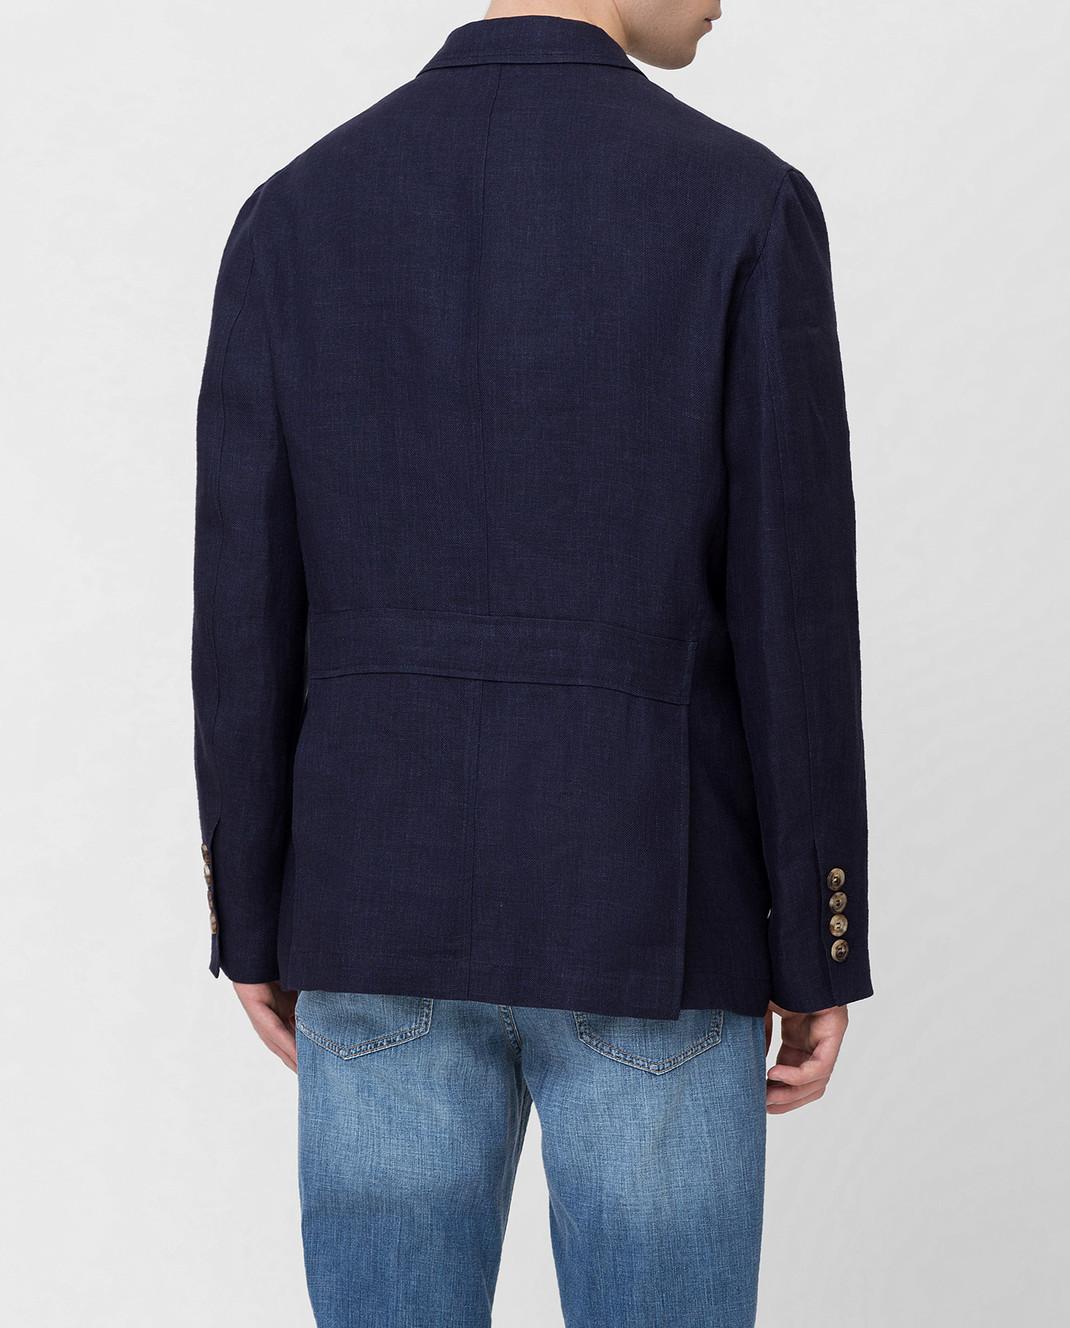 Brunello Cucinelli Синяя куртка MD4176848 изображение 4